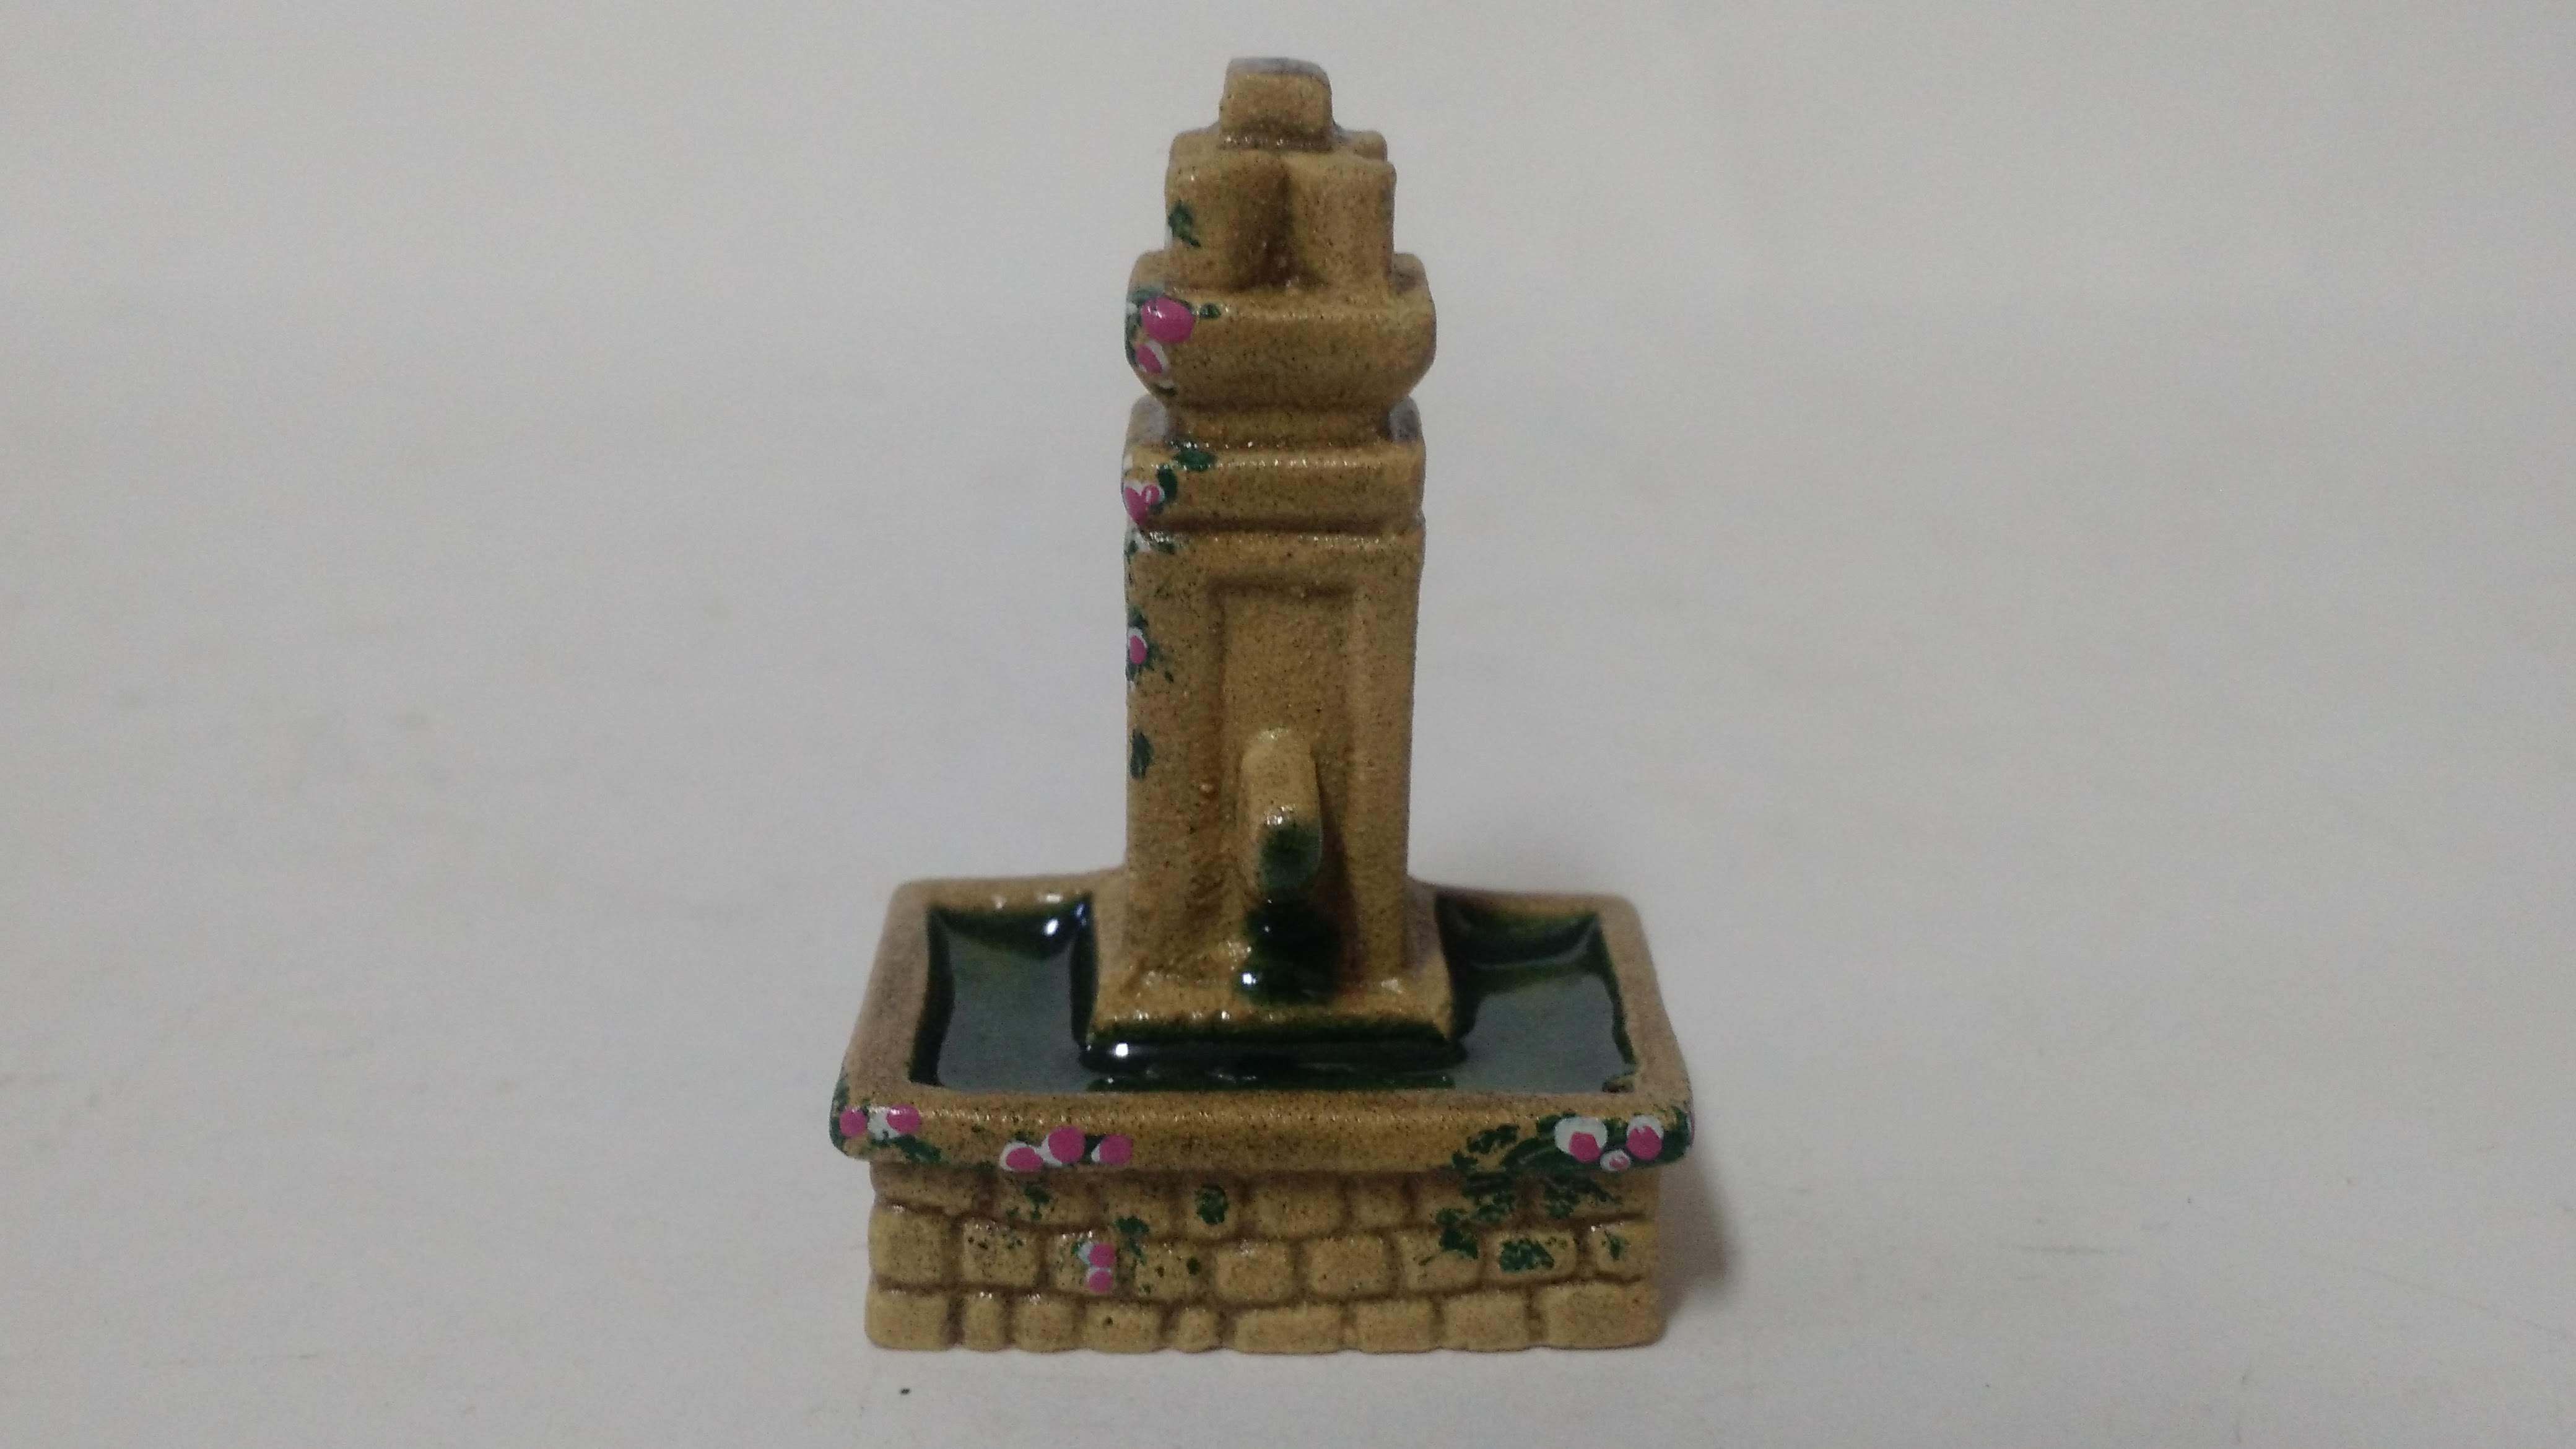 Miniaturas Dominique Gault J Carlton Itália toscânia Veneza Roma-Tinteiro Art